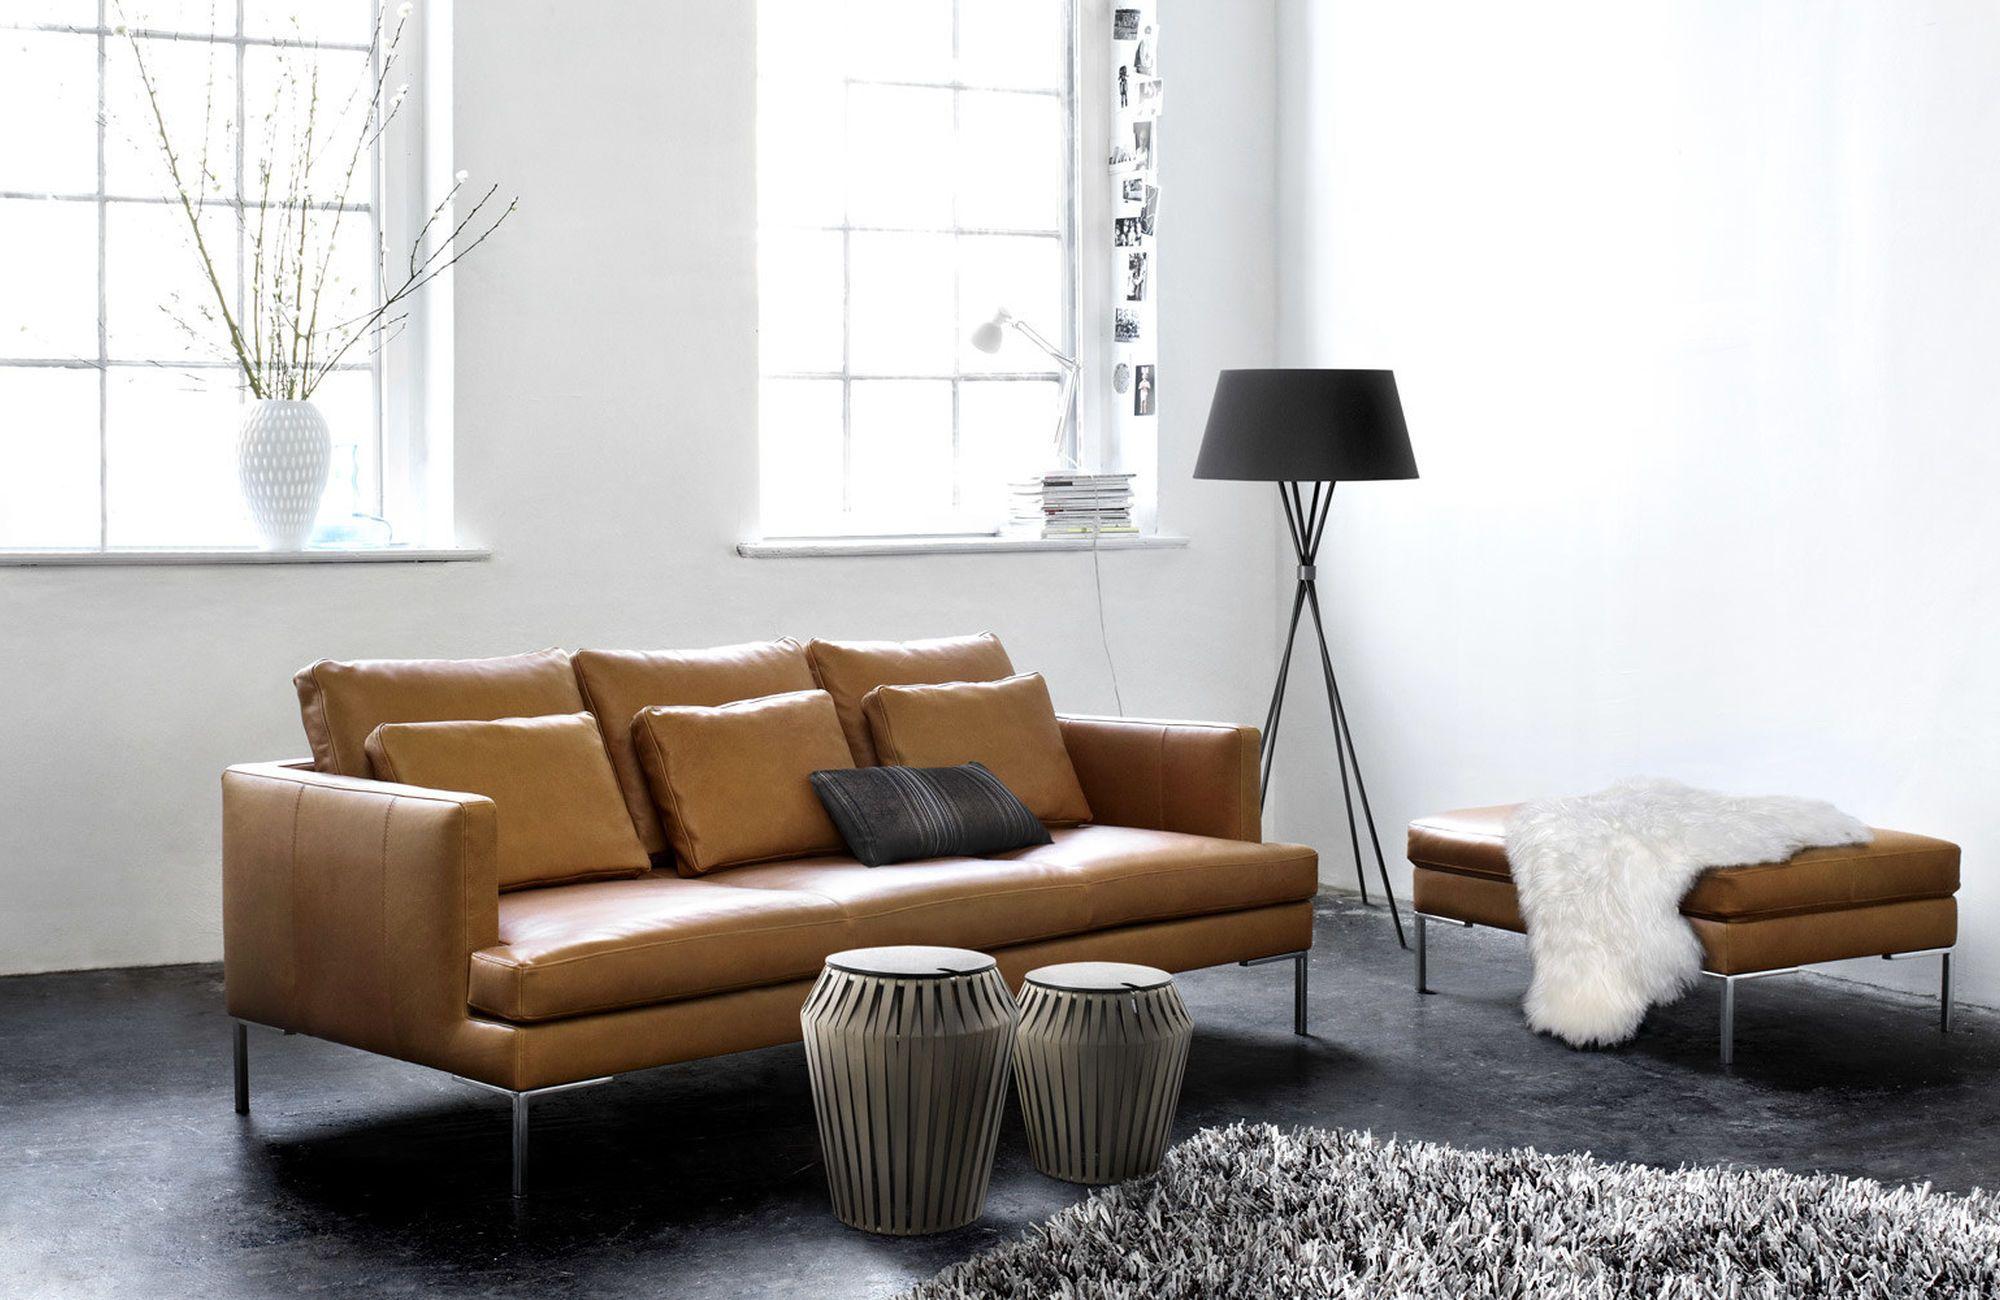 3 Seater Sofas Istra 2 Sofa Sofa Inspiration Leather Sofa Best Leather Sofa